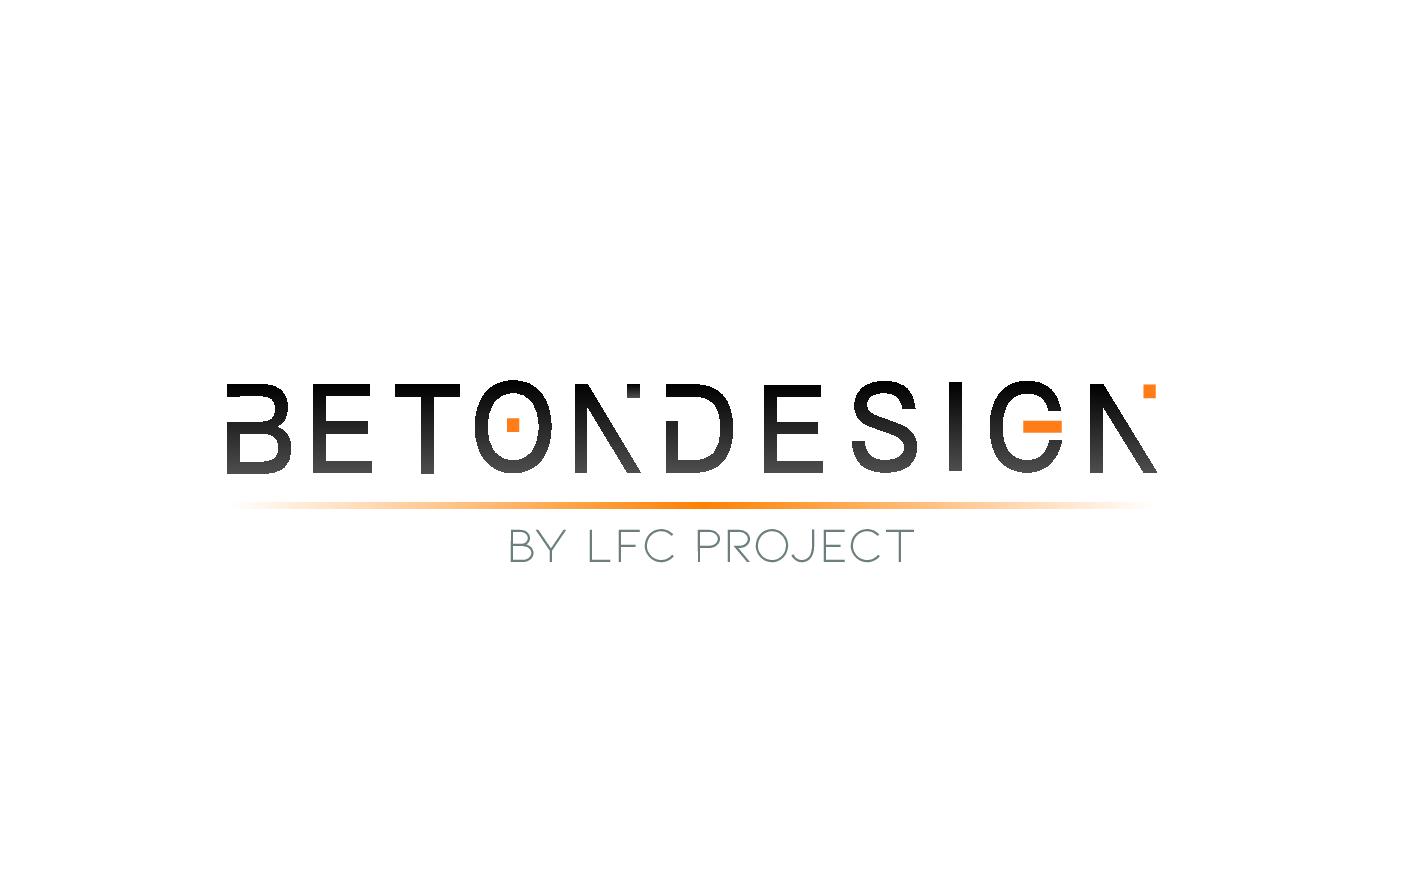 Beton Design